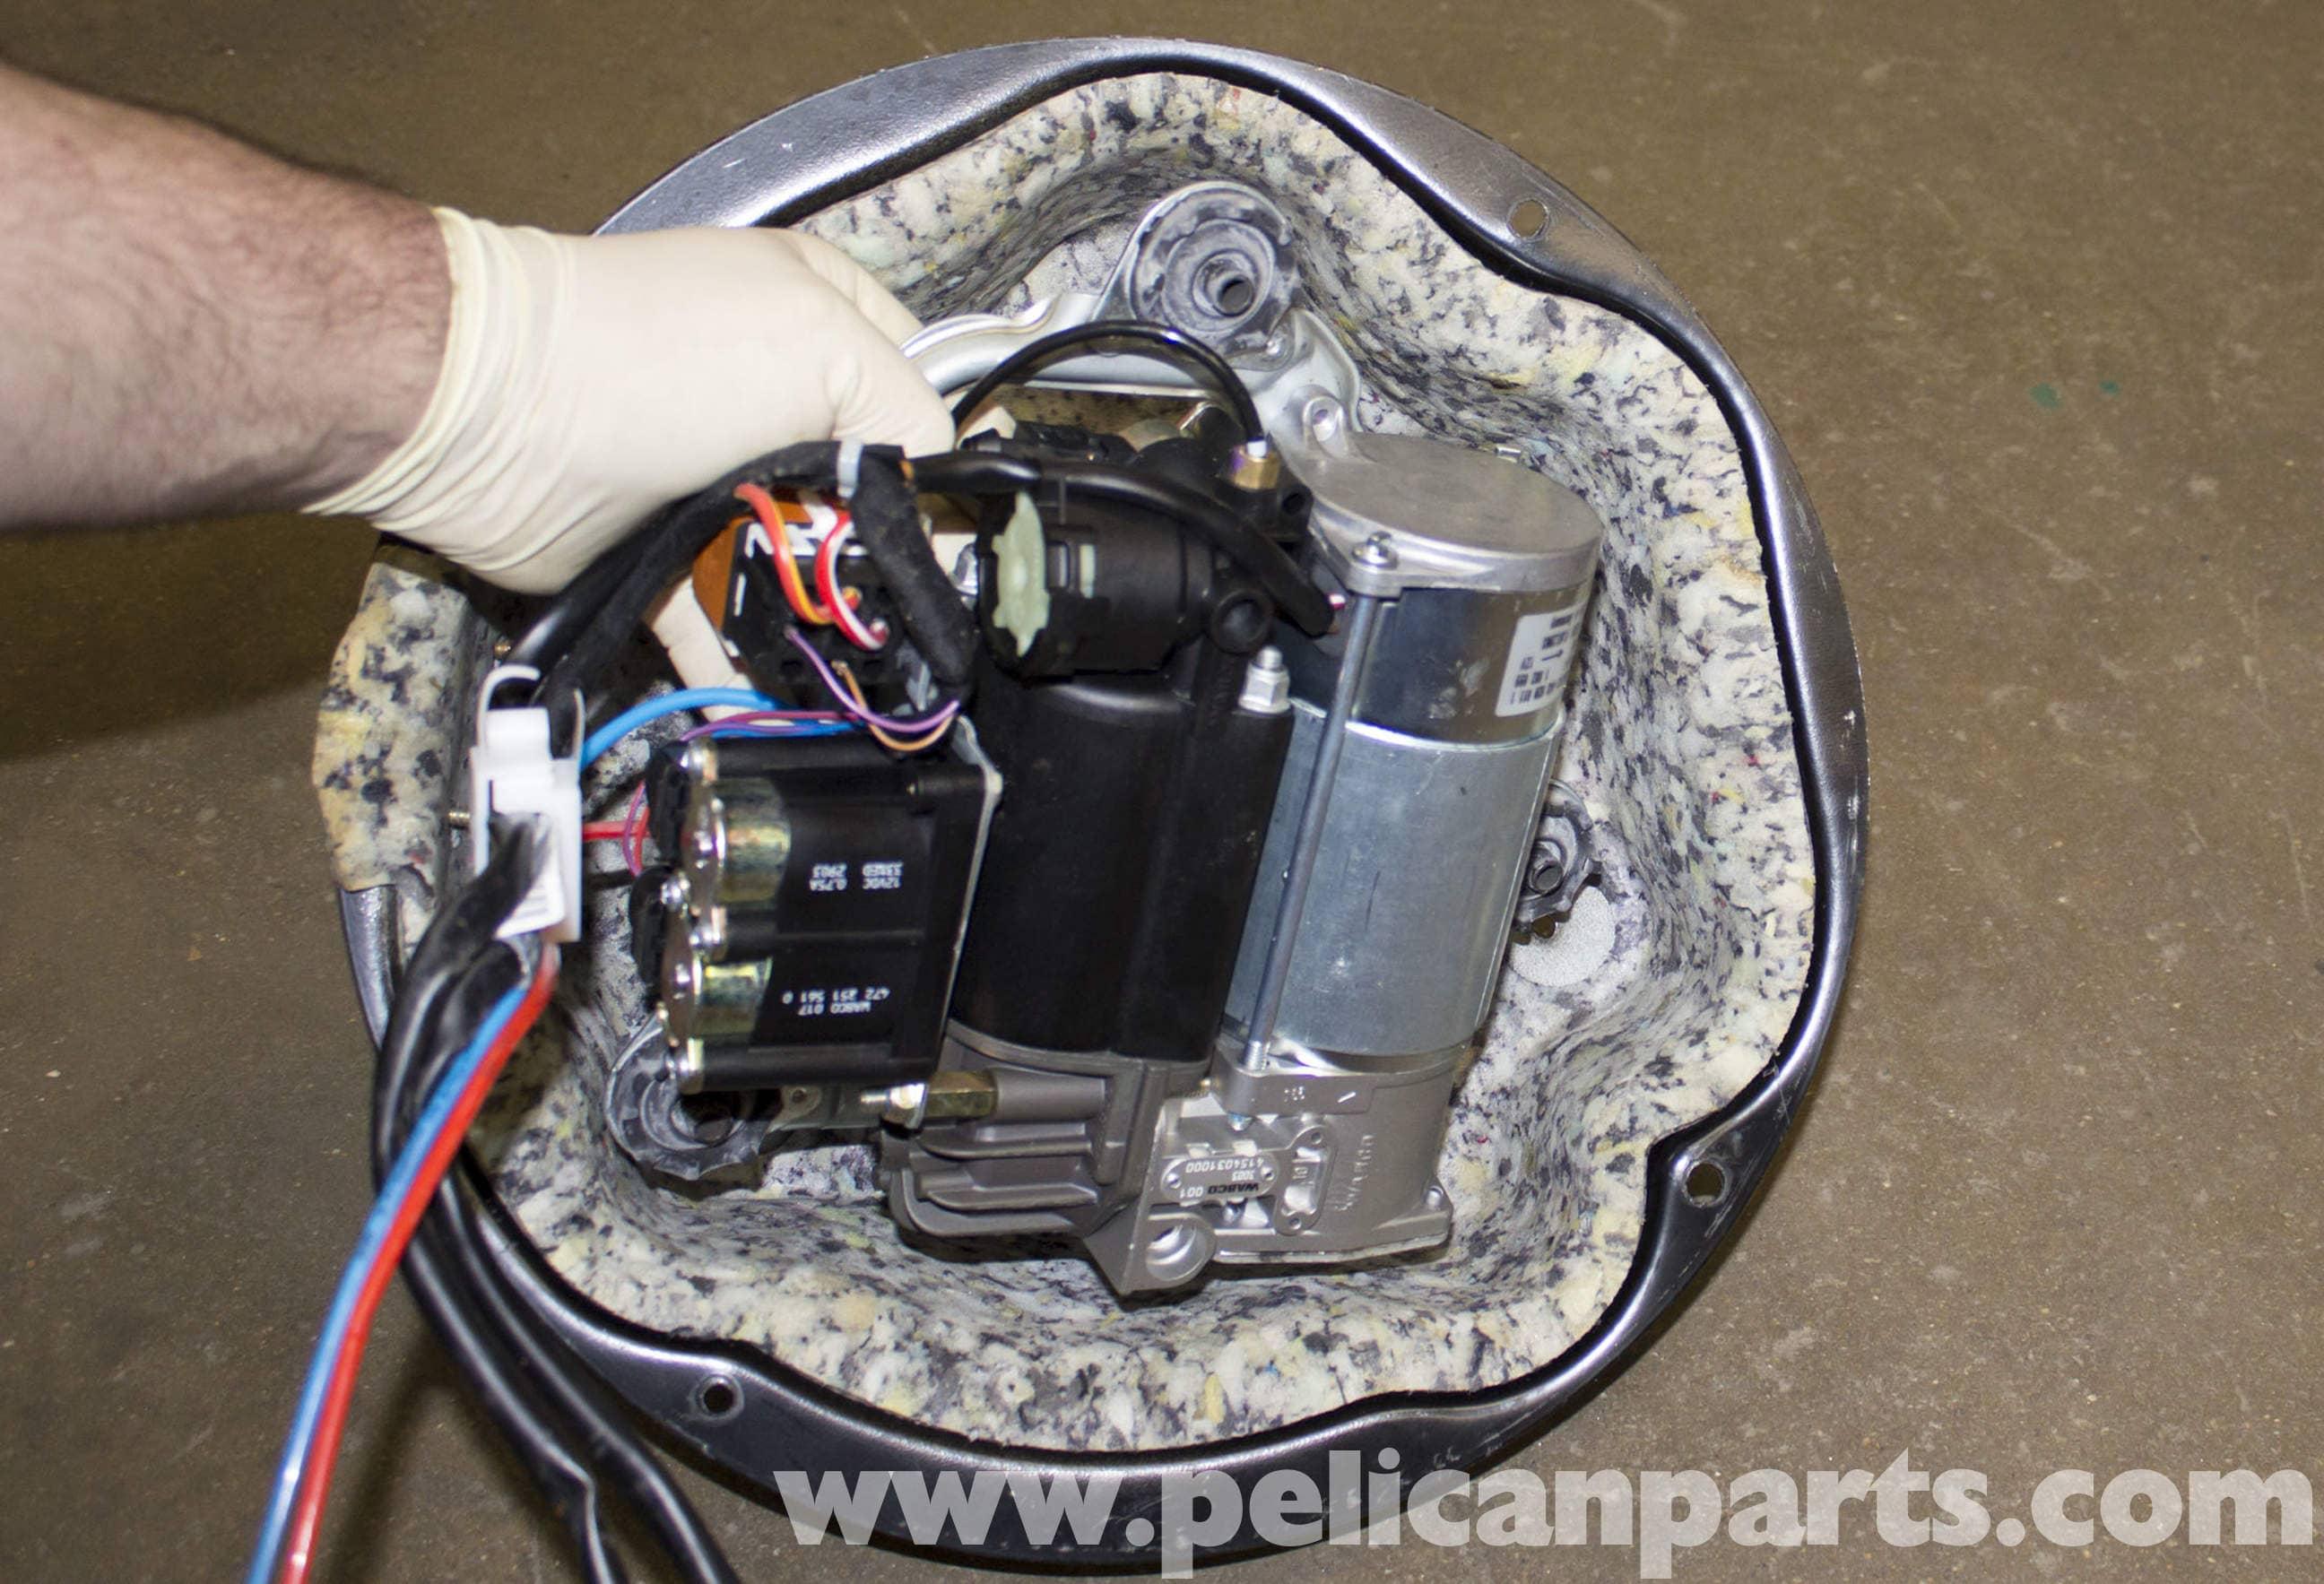 BMW X5 Suspension Air Pump Replacement (E53 2000 - 2006